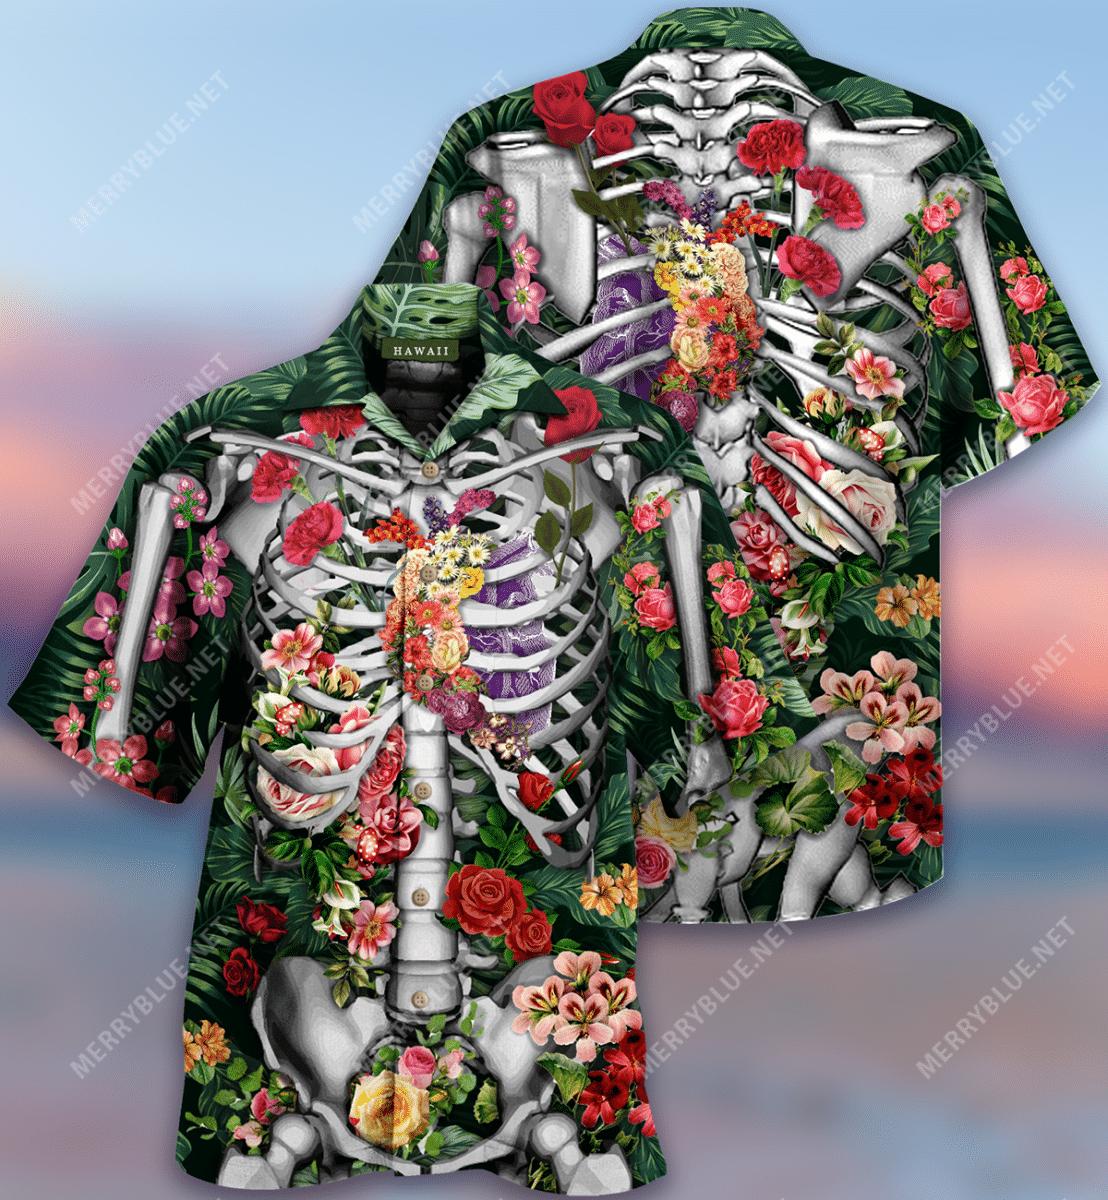 On The Inside We Are All The Same Hawaiian Shirt